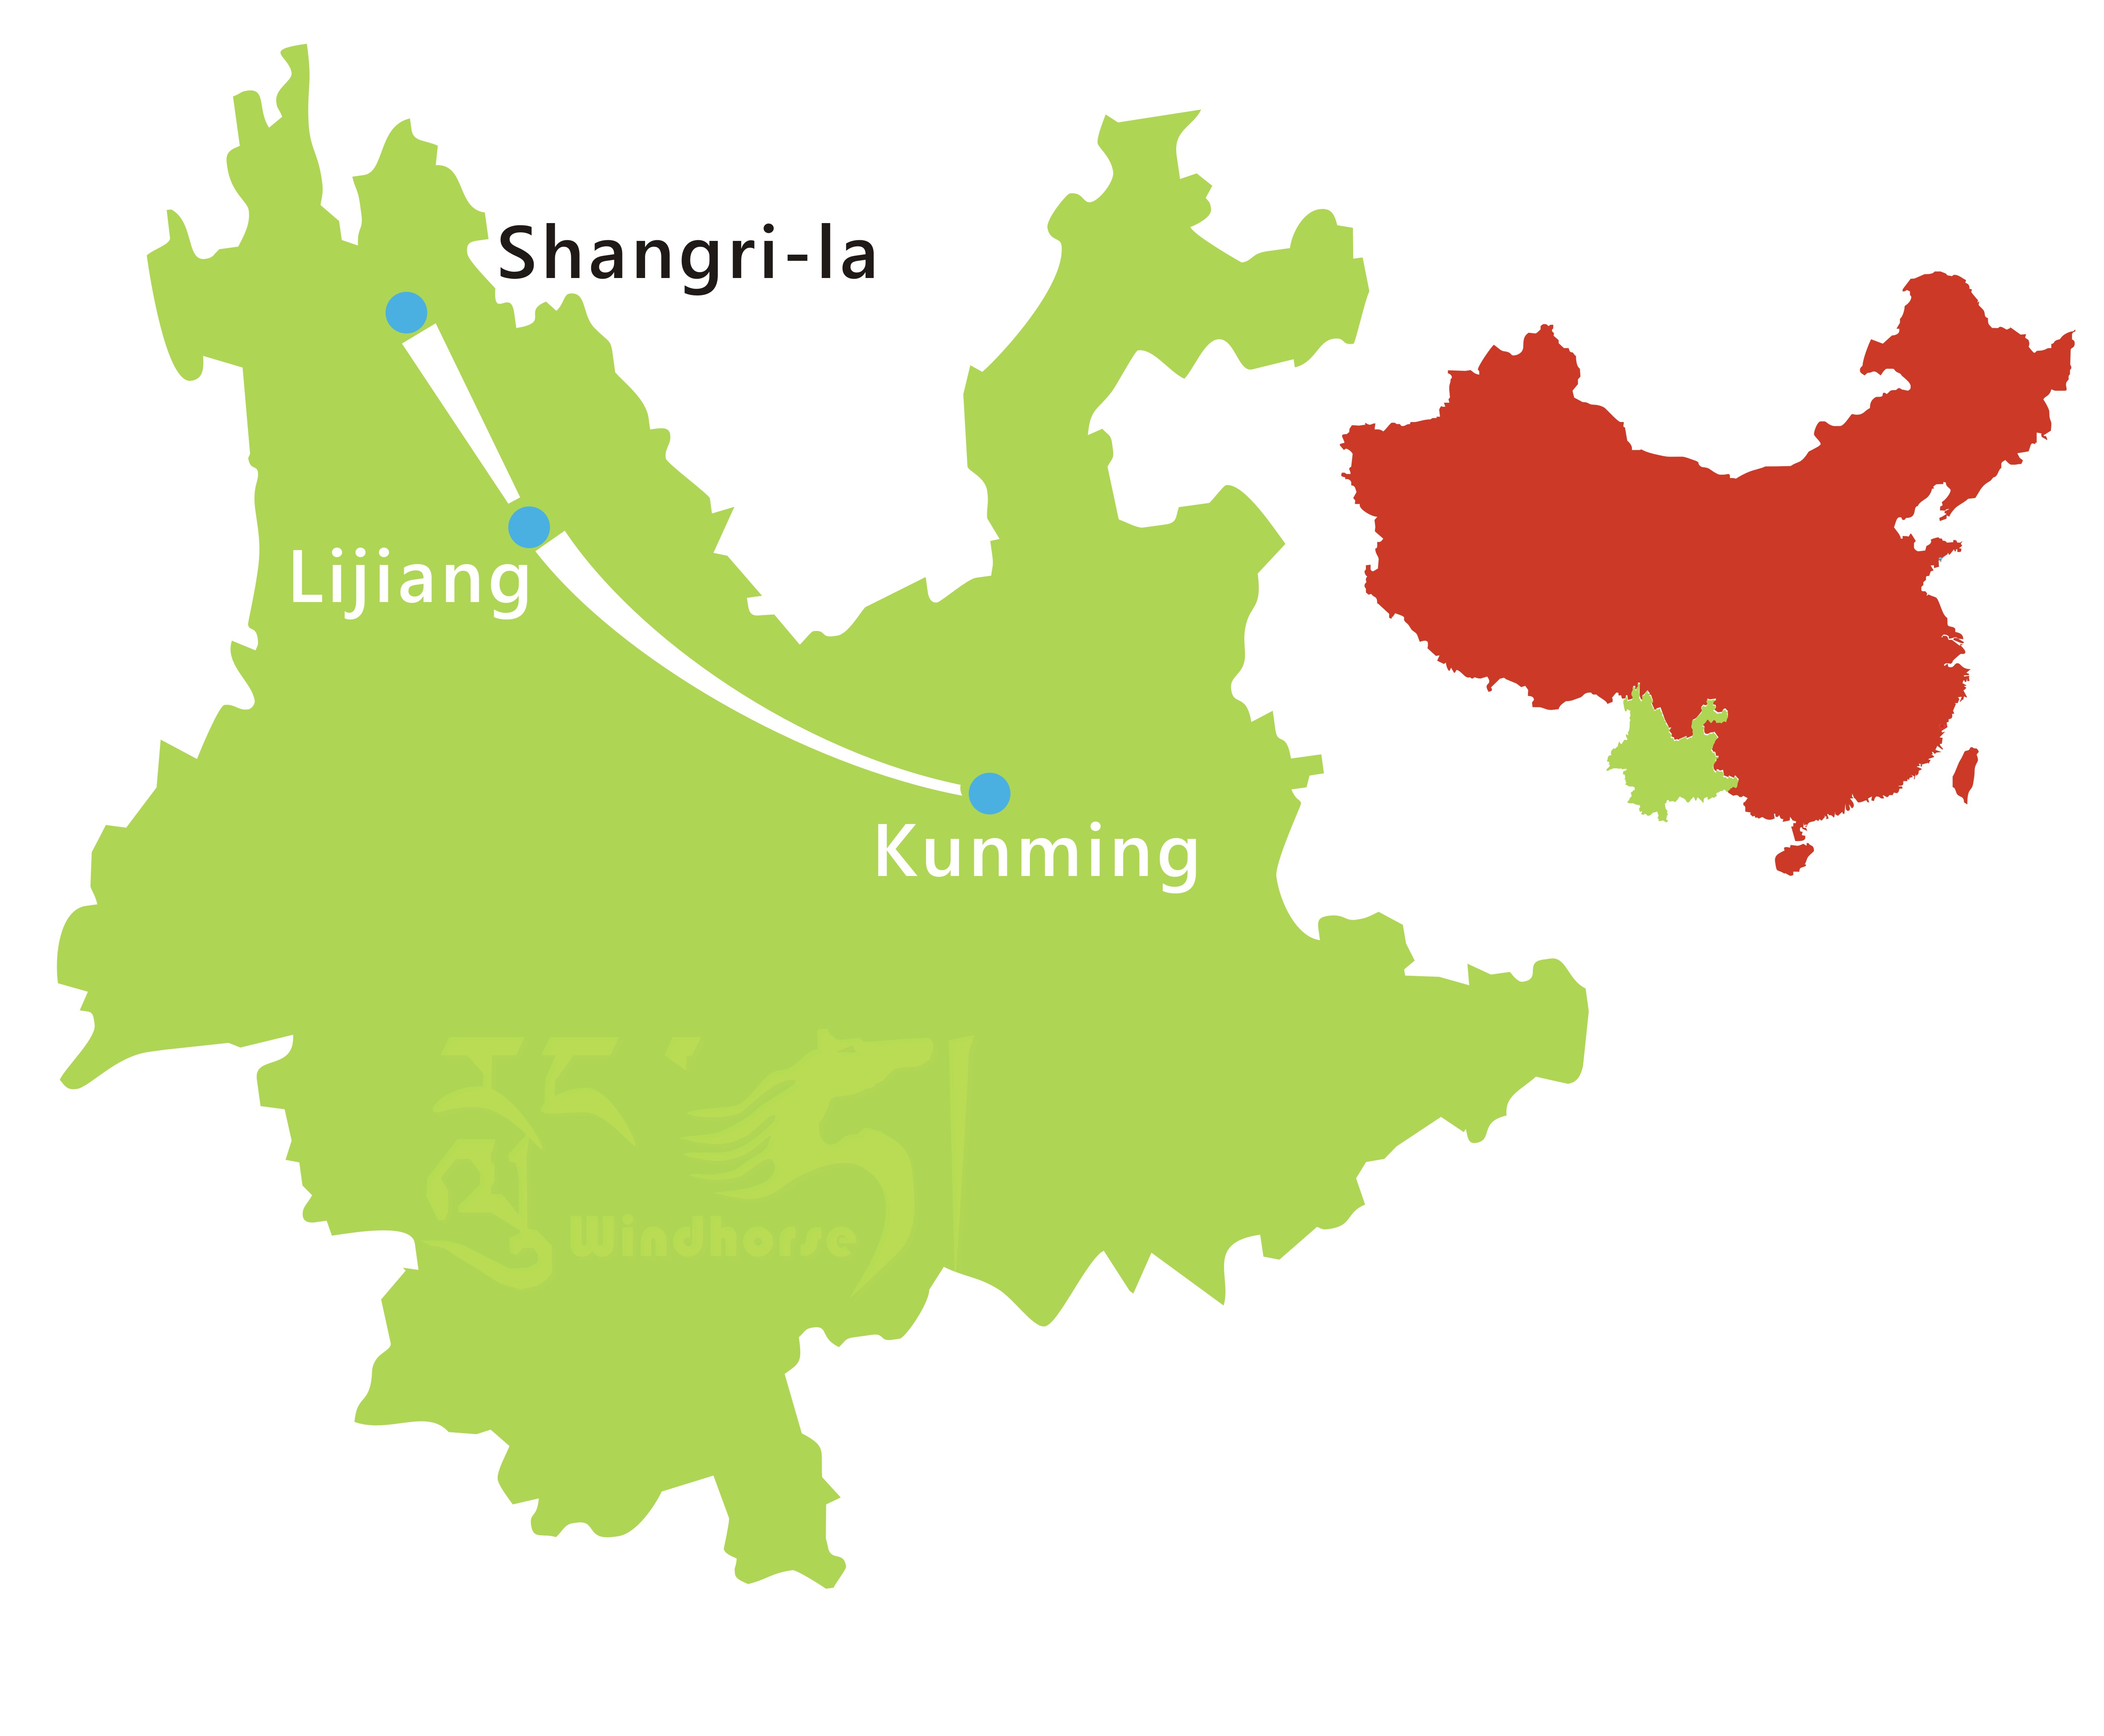 Lijiang Shangri-la Trekking Tour Route